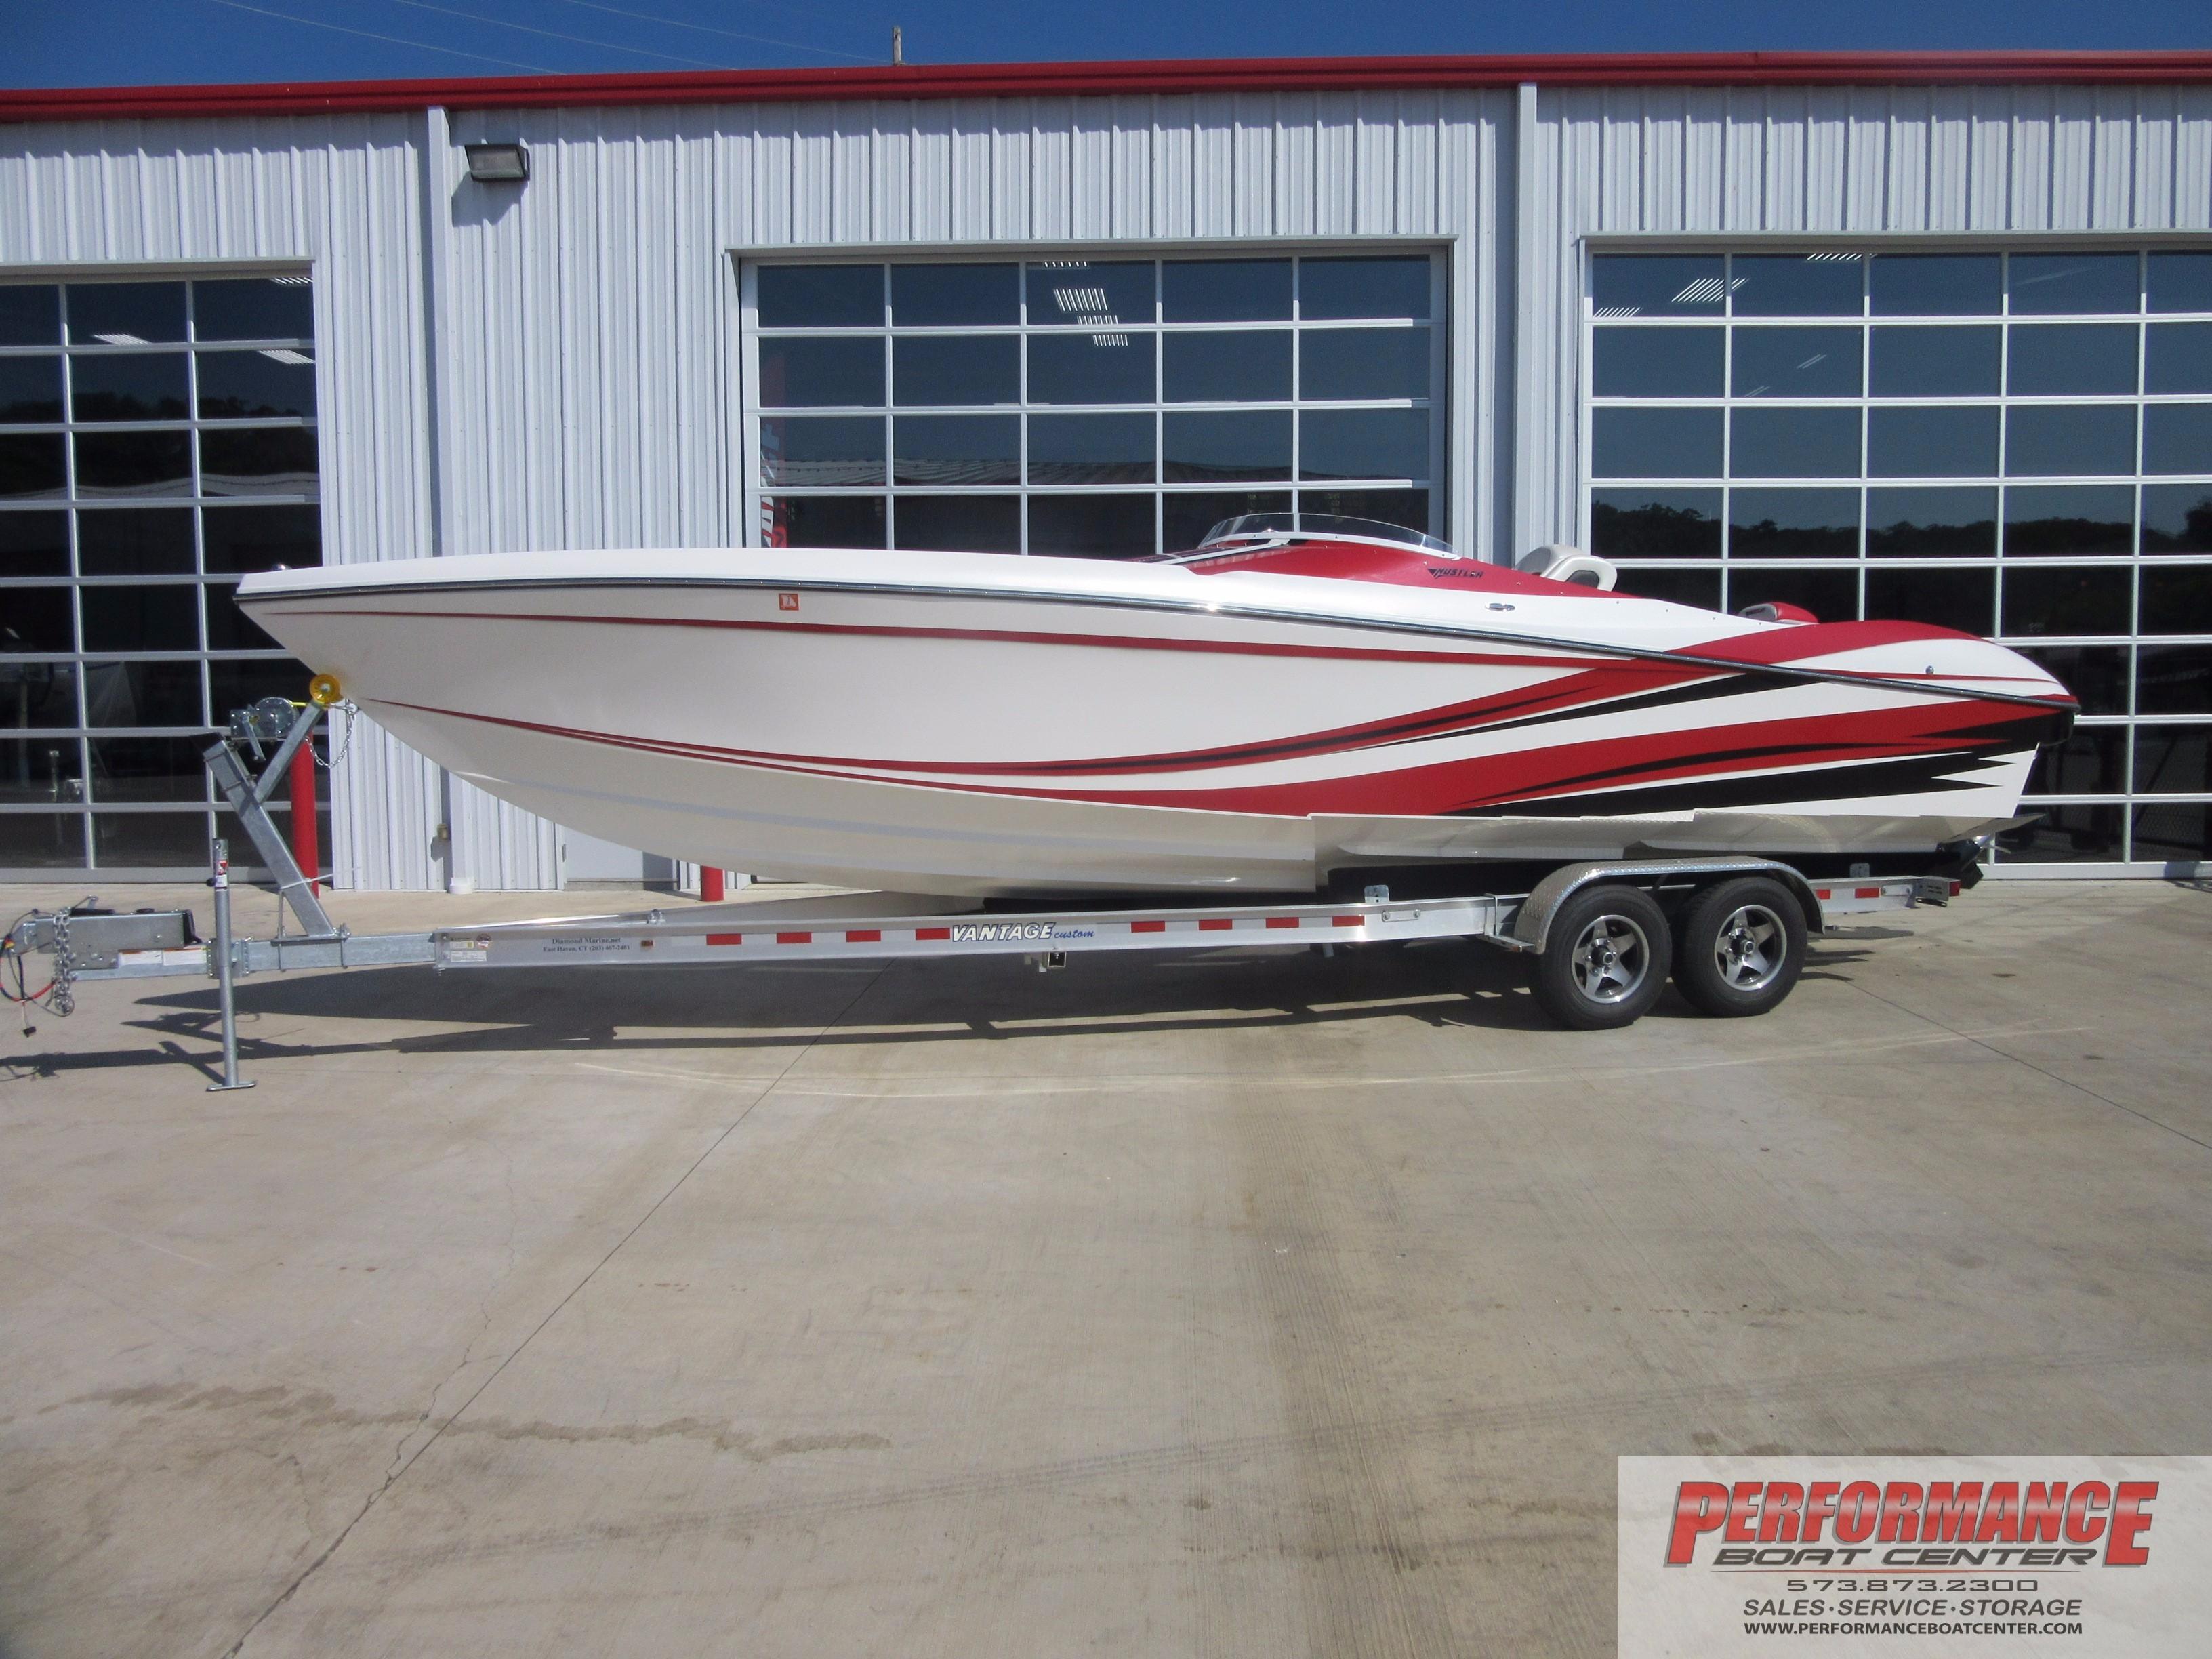 Hustler 377 powerboat for sale sorry